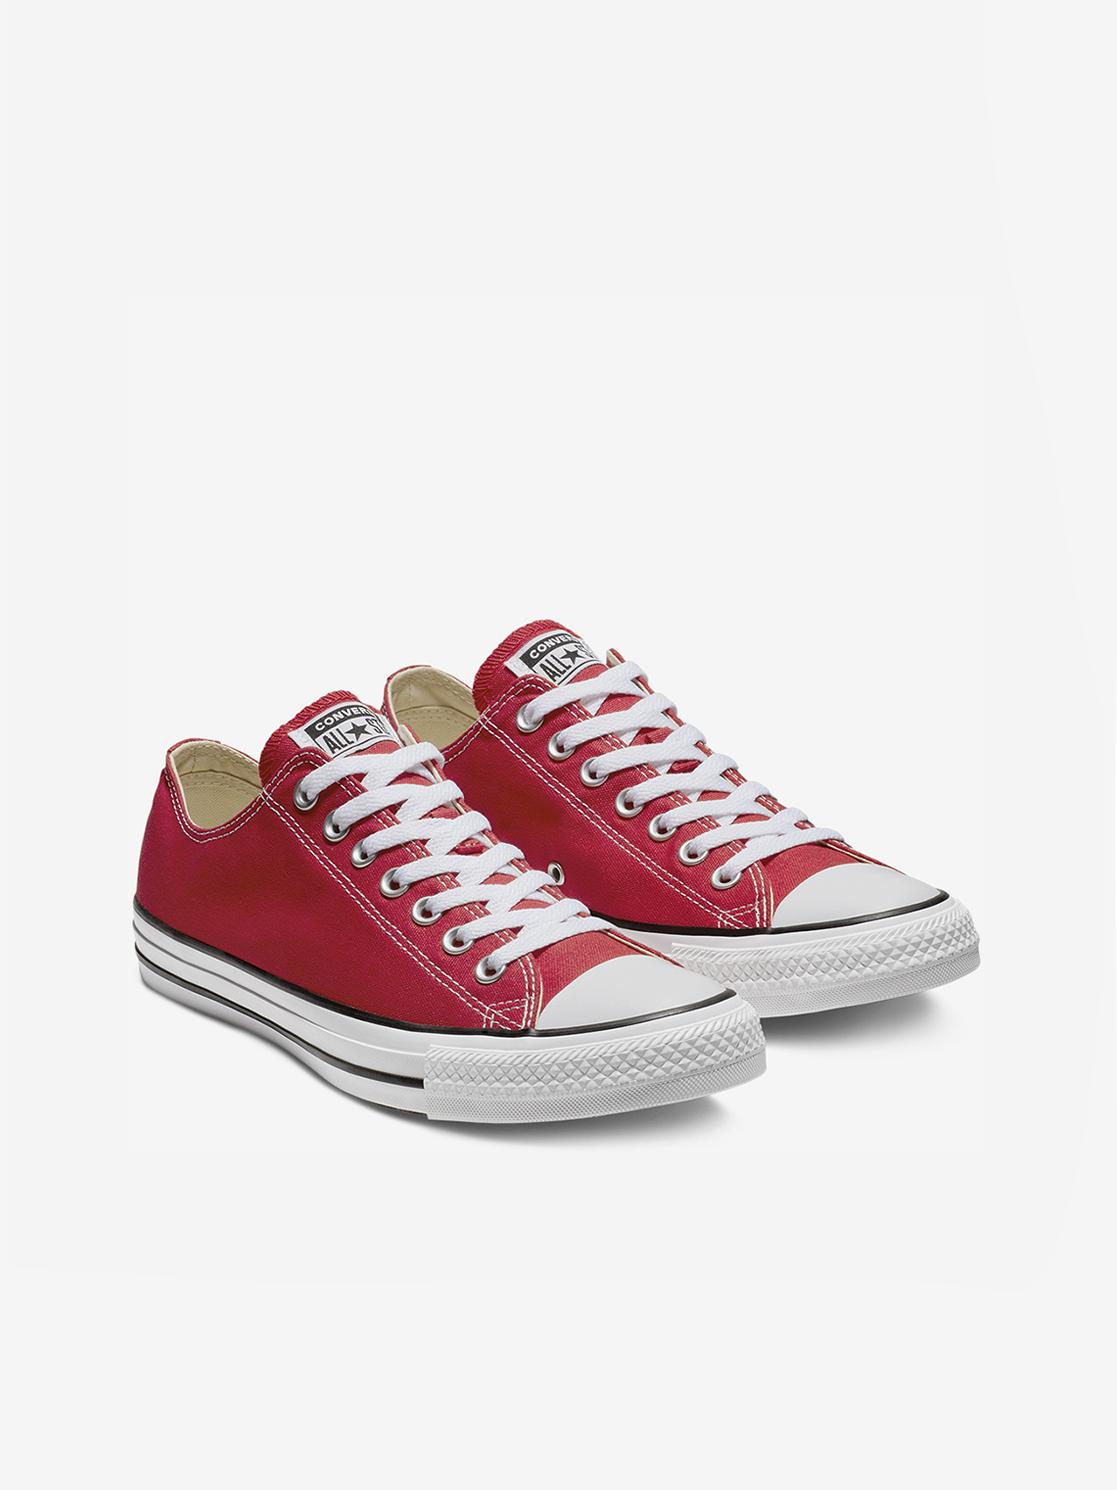 Converse czerwone unisex trampki Chuck Taylor All Star Classic Colors